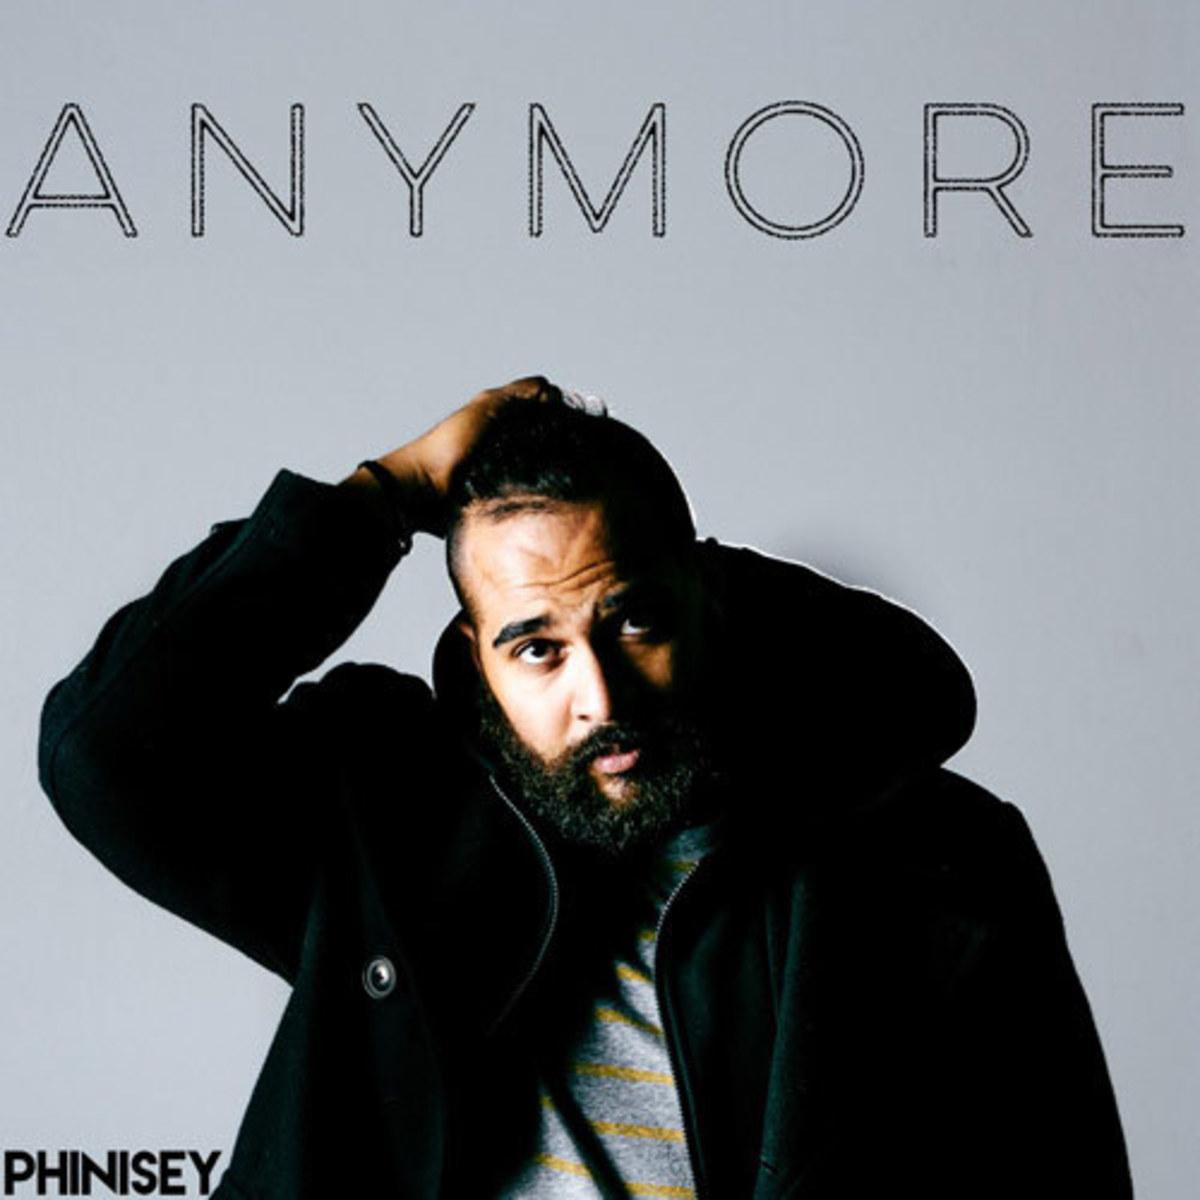 phinisey-anymore.jpg